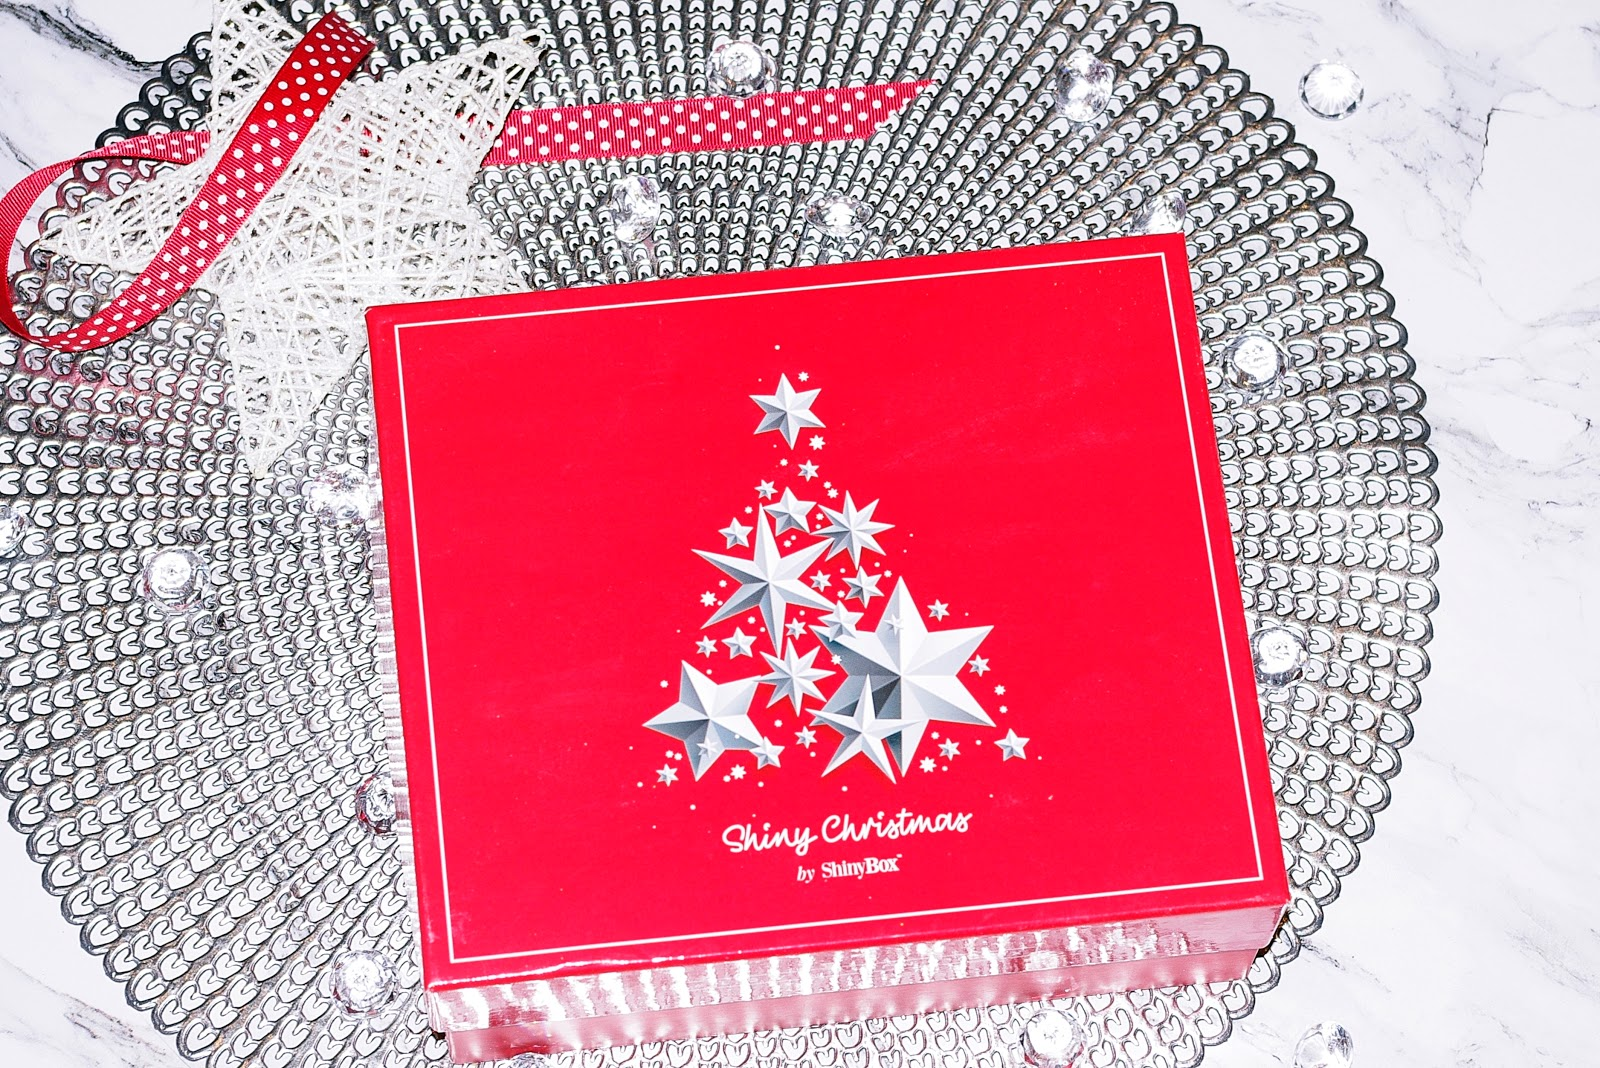 Shinybox Shiny Christmas grudzień 2018